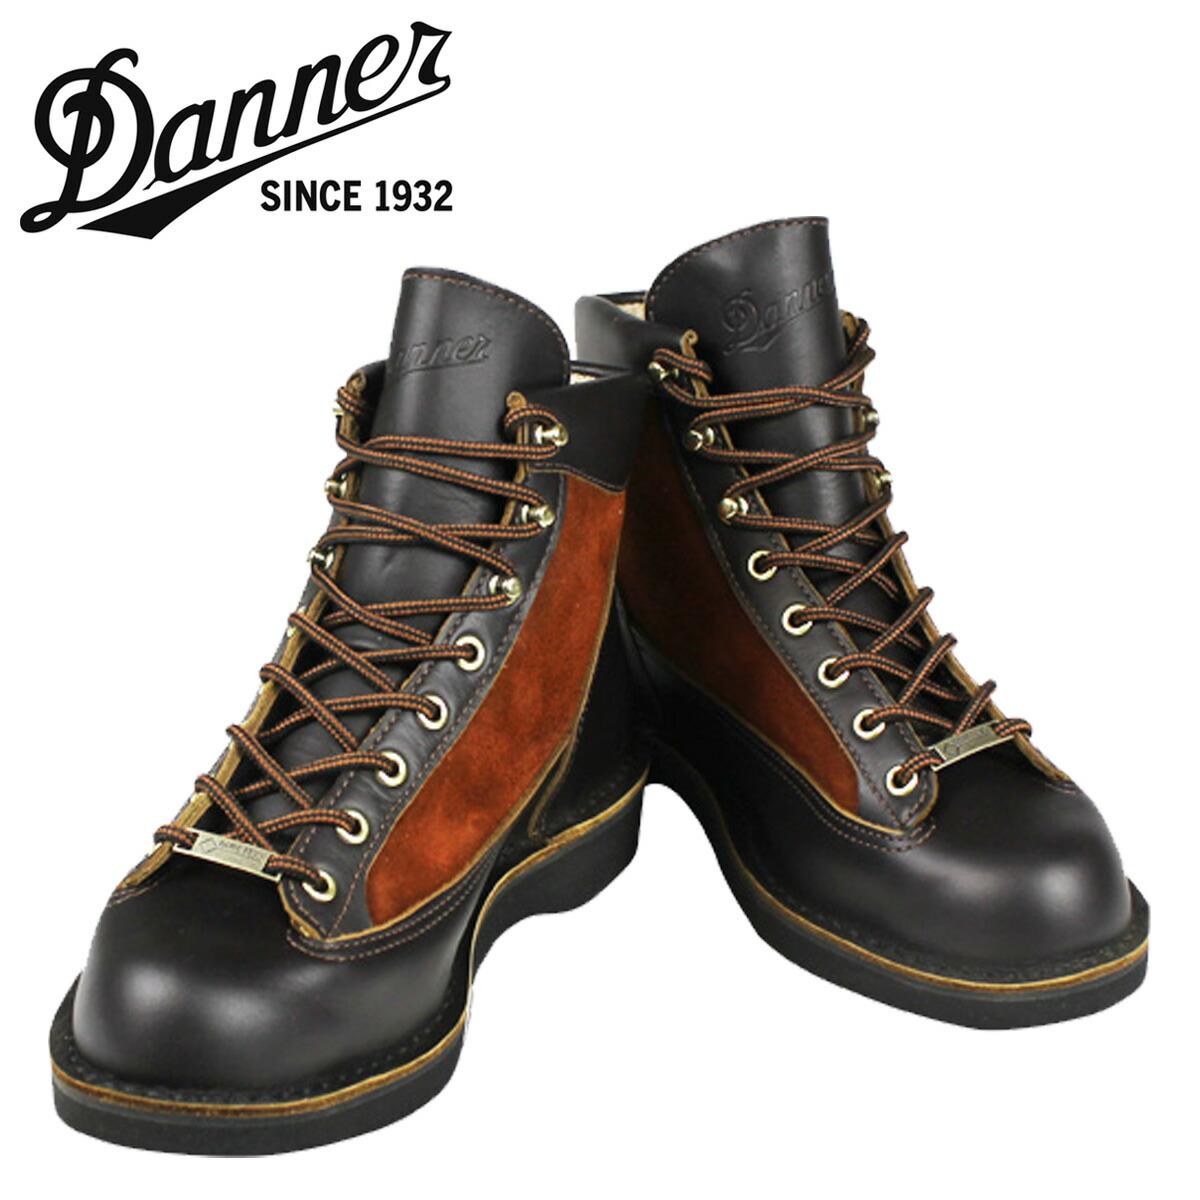 ALLSPORTS | Rakuten Global Market: Danner Danner ダナーライト ...